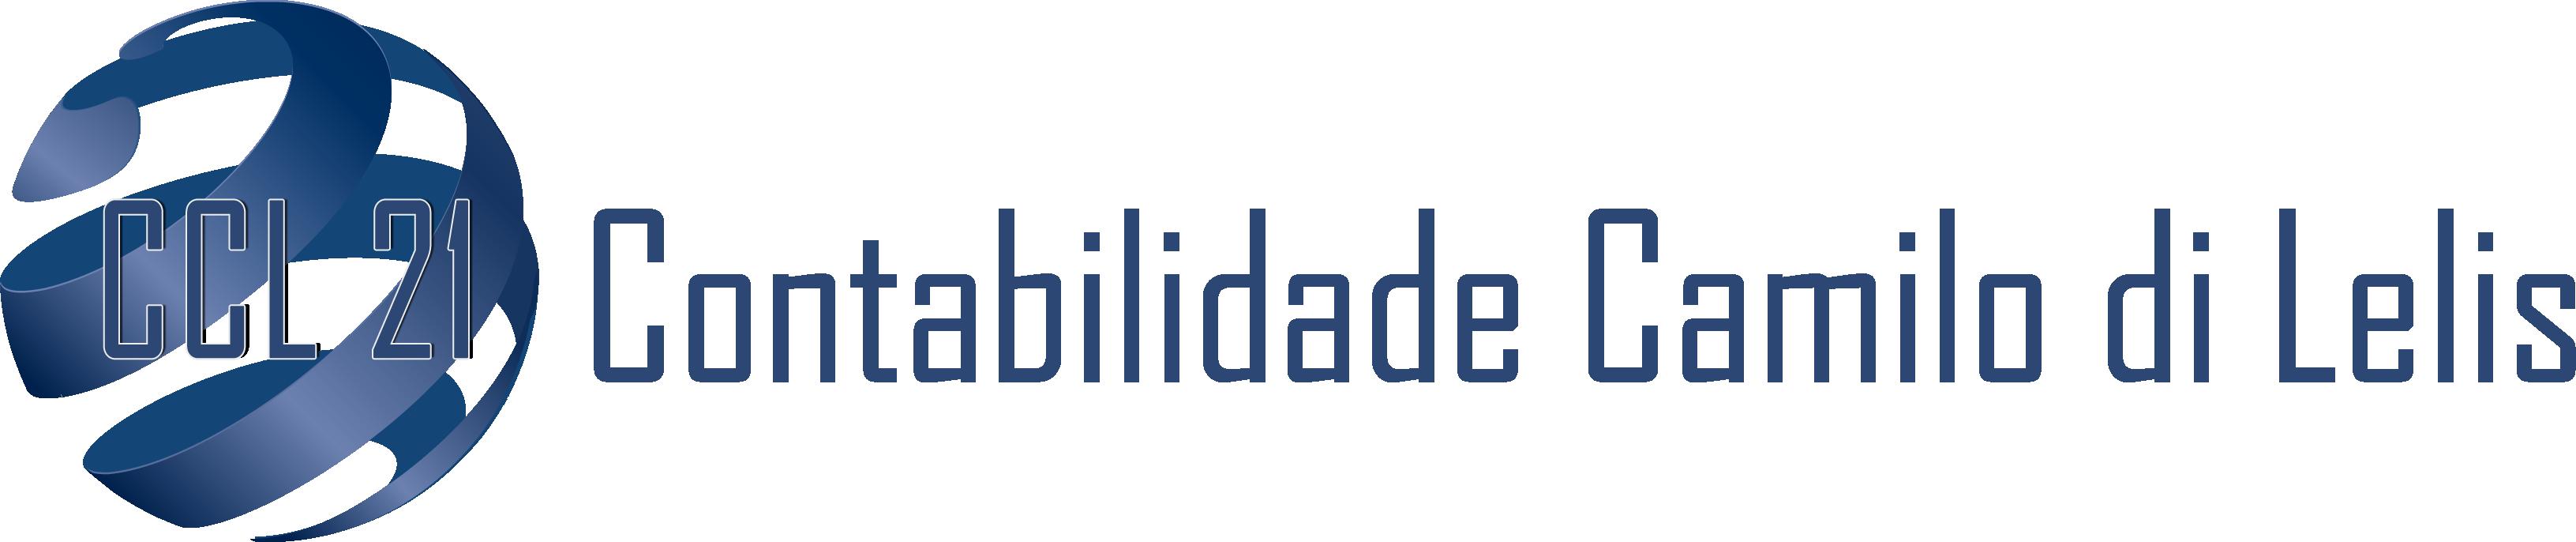 CONTABILIDADE CAMILO DI LELIS S/S